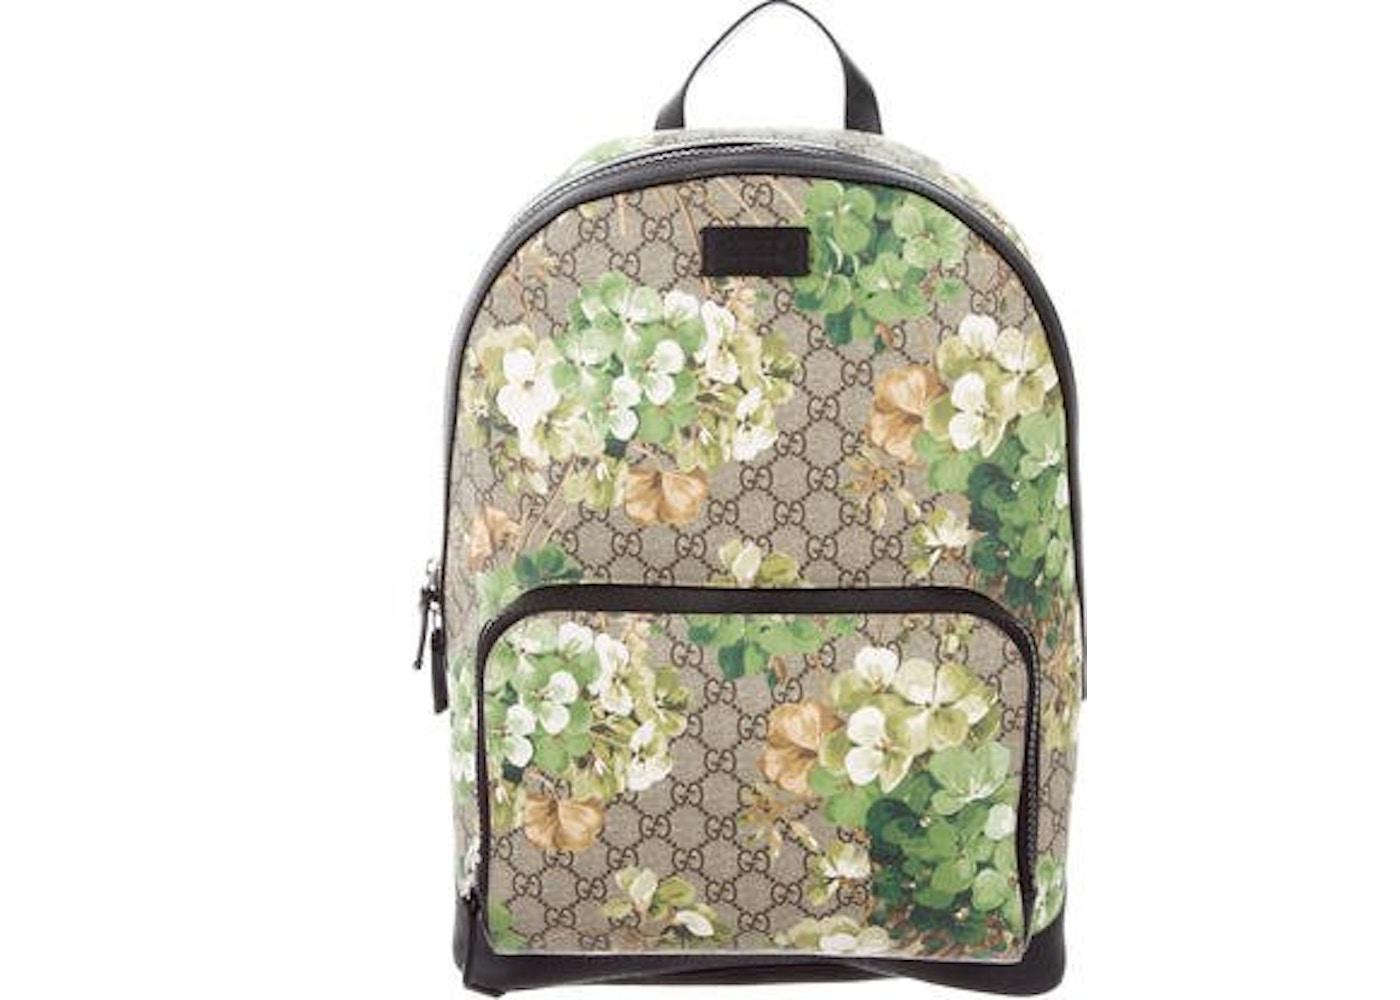 9a796fad6c5e1b Gucci GG Supreme Backpack GG Supreme Floral Print Beige/Ebony ...